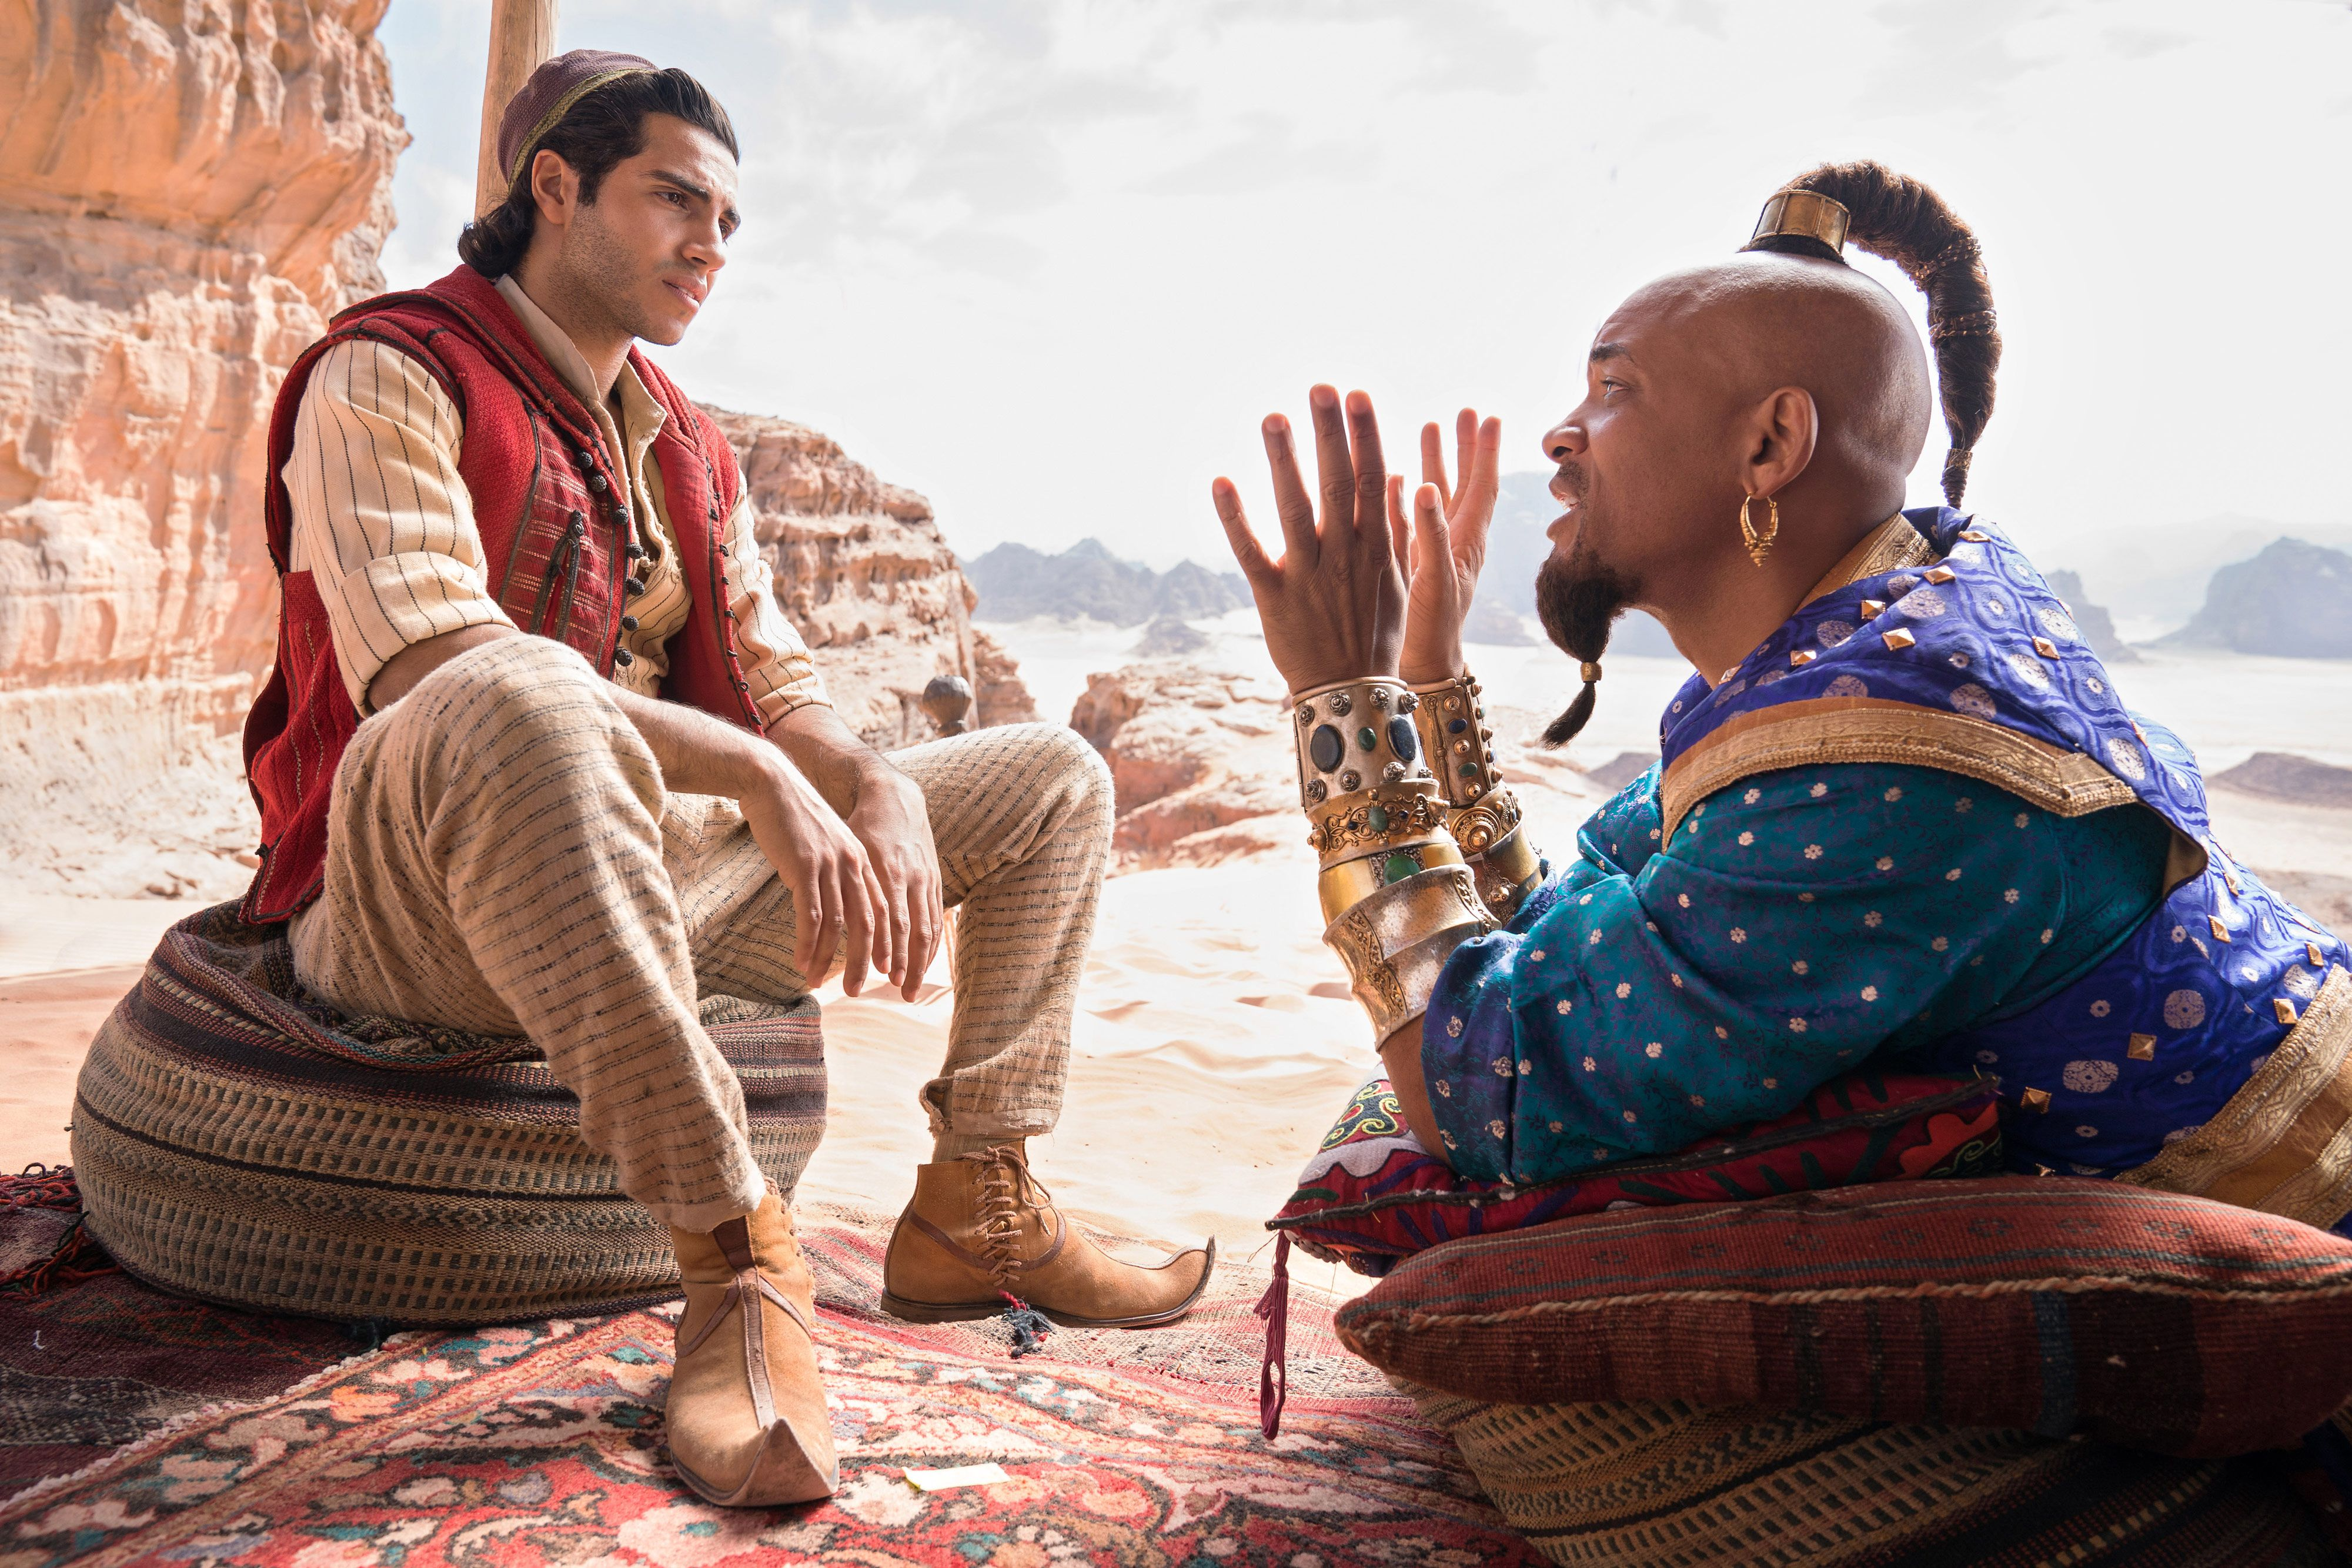 Disney S Live Action Aladdin Remake Has A Hidden Easter Egg